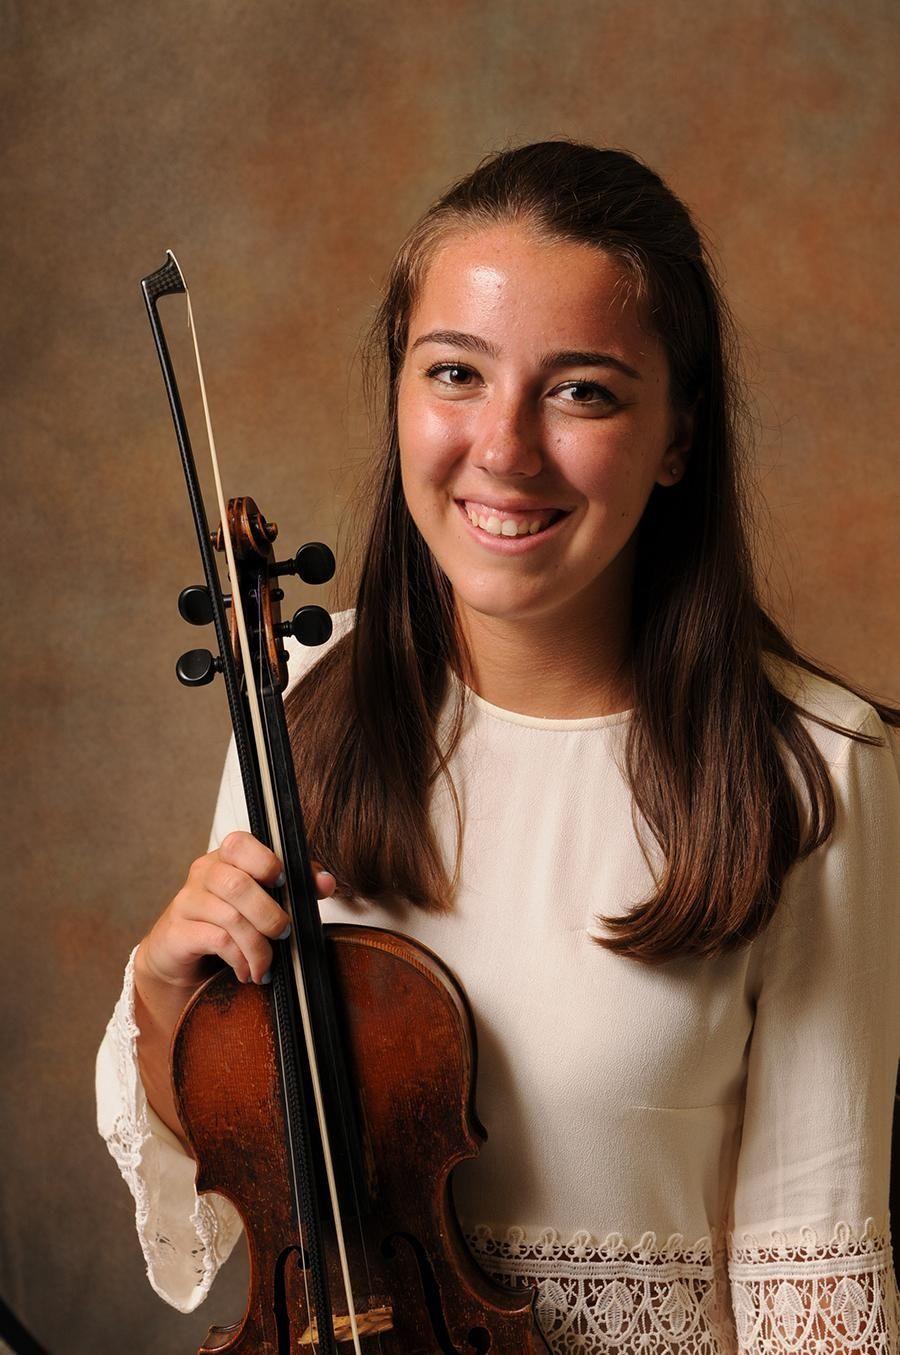 Kellenberg High School's Erin Lyons is a gifted